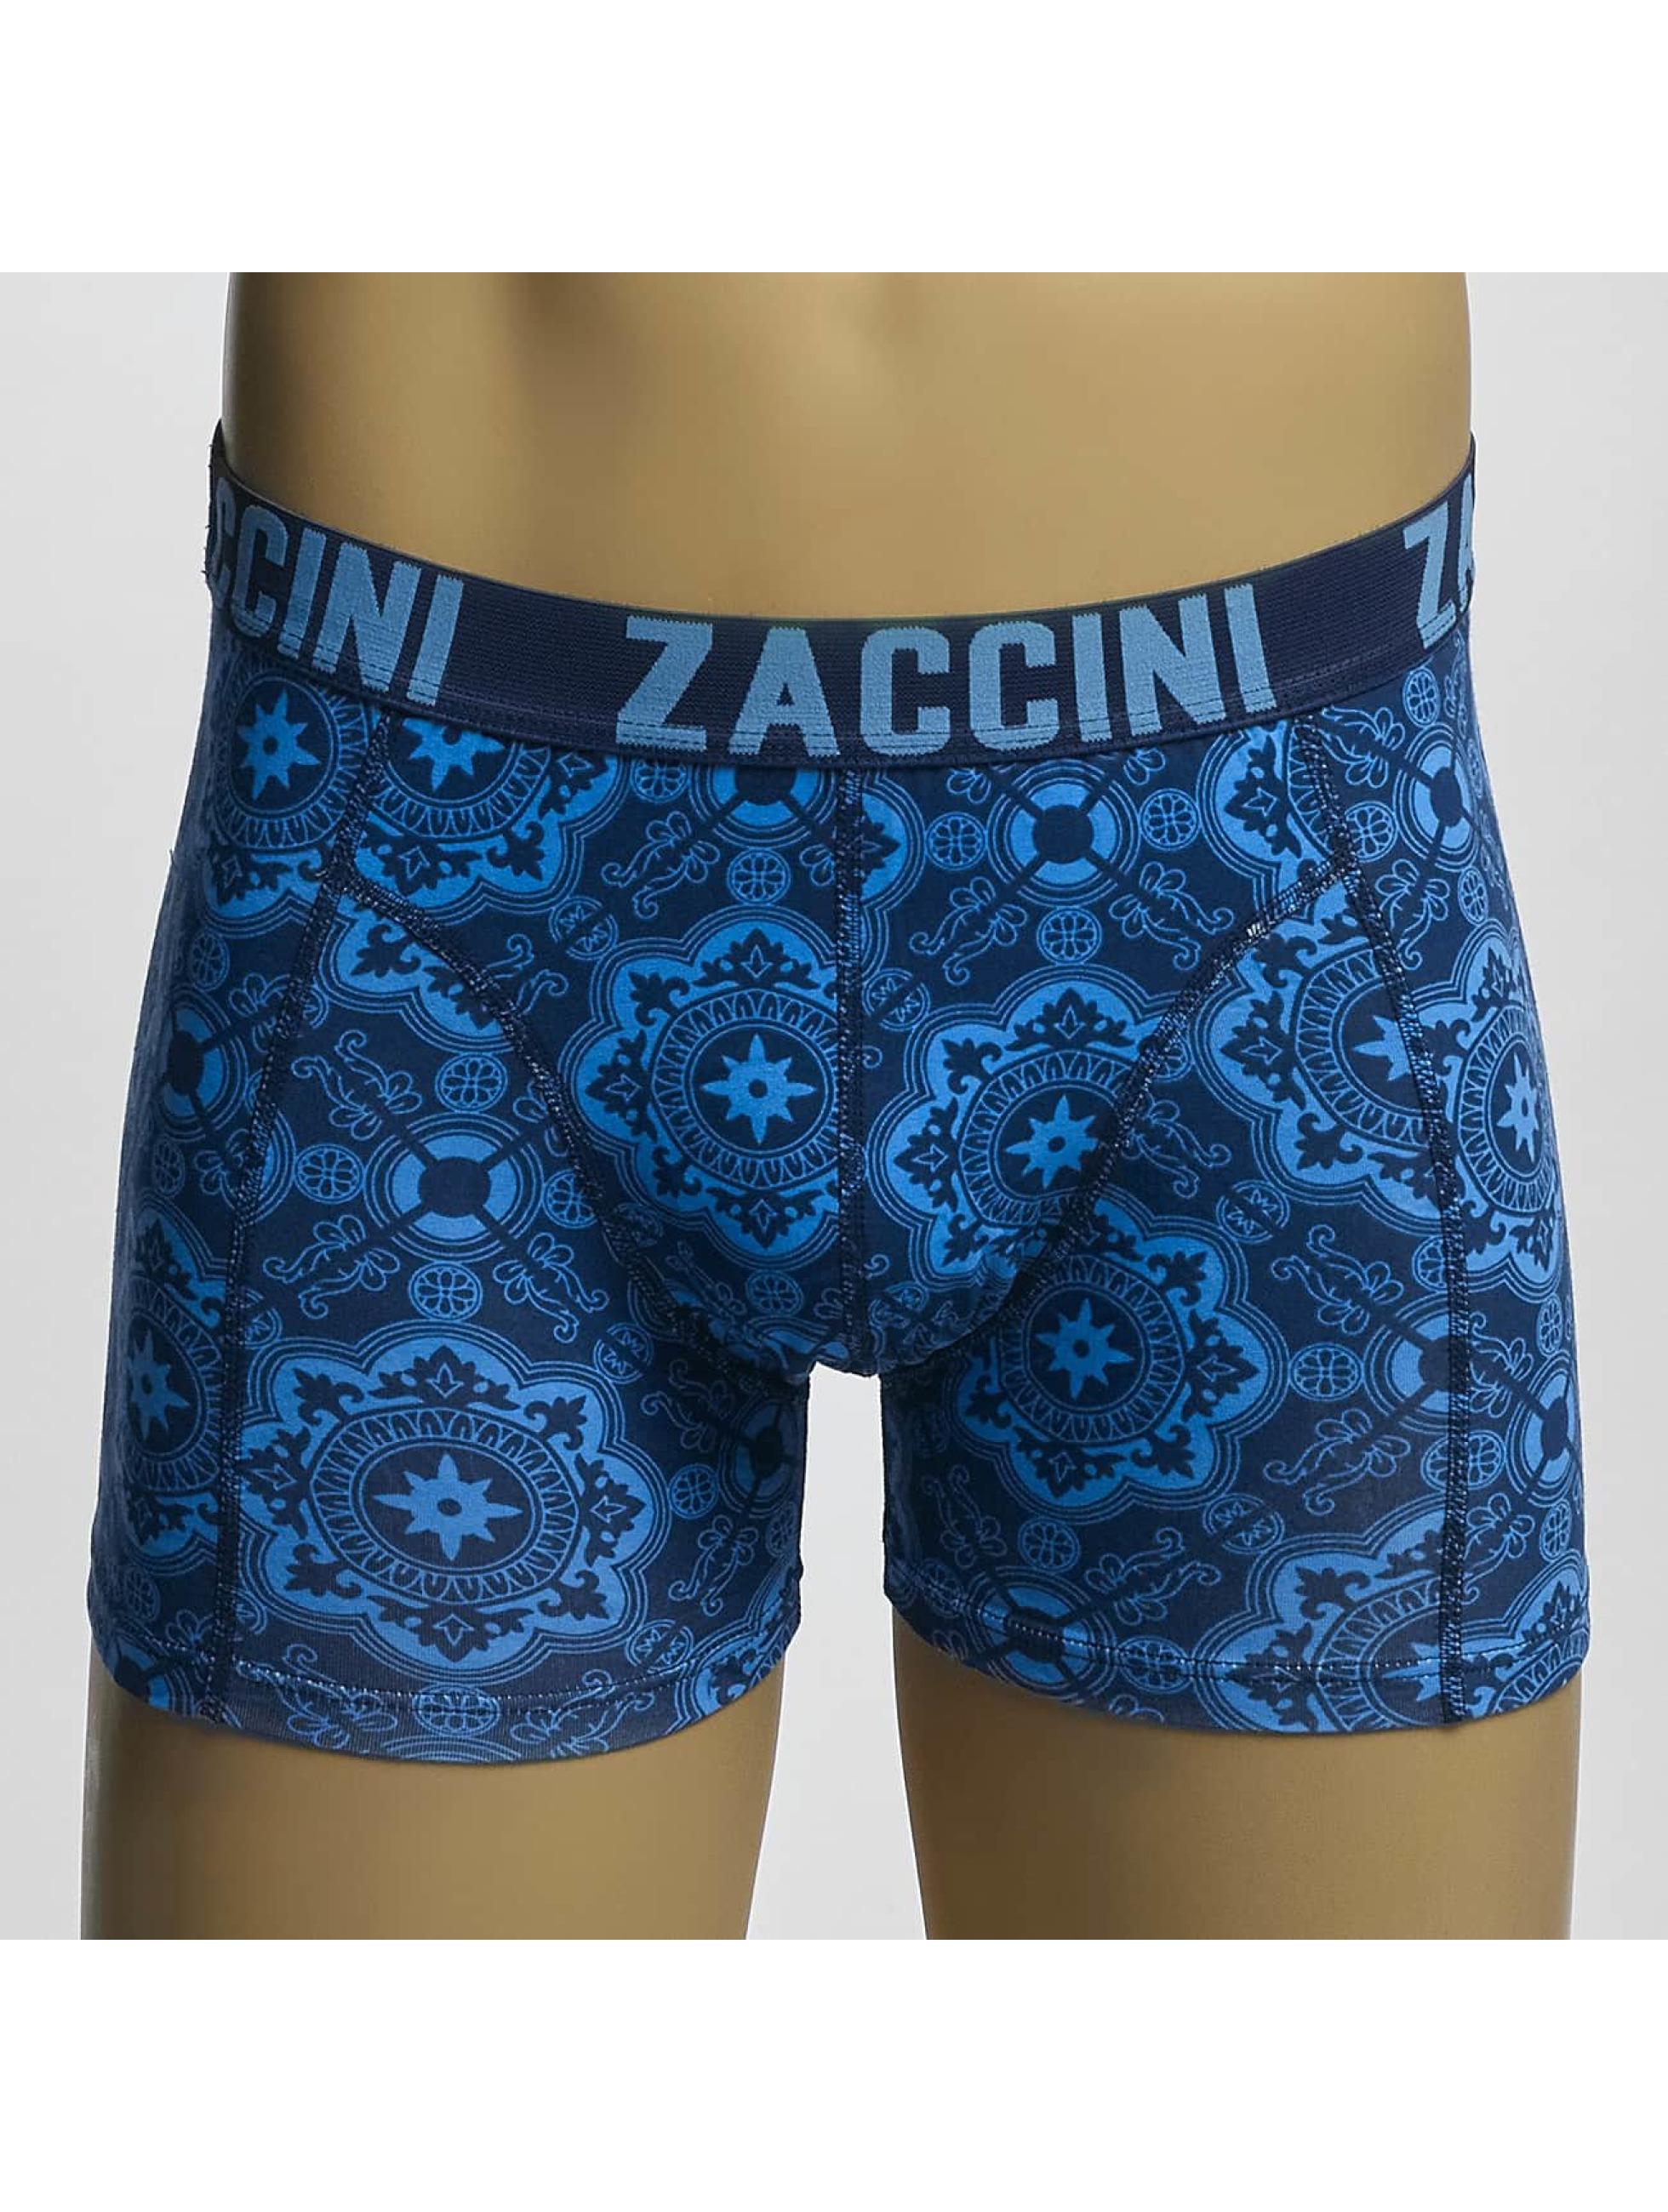 Zaccini Boxer Short Blue Tiles blue